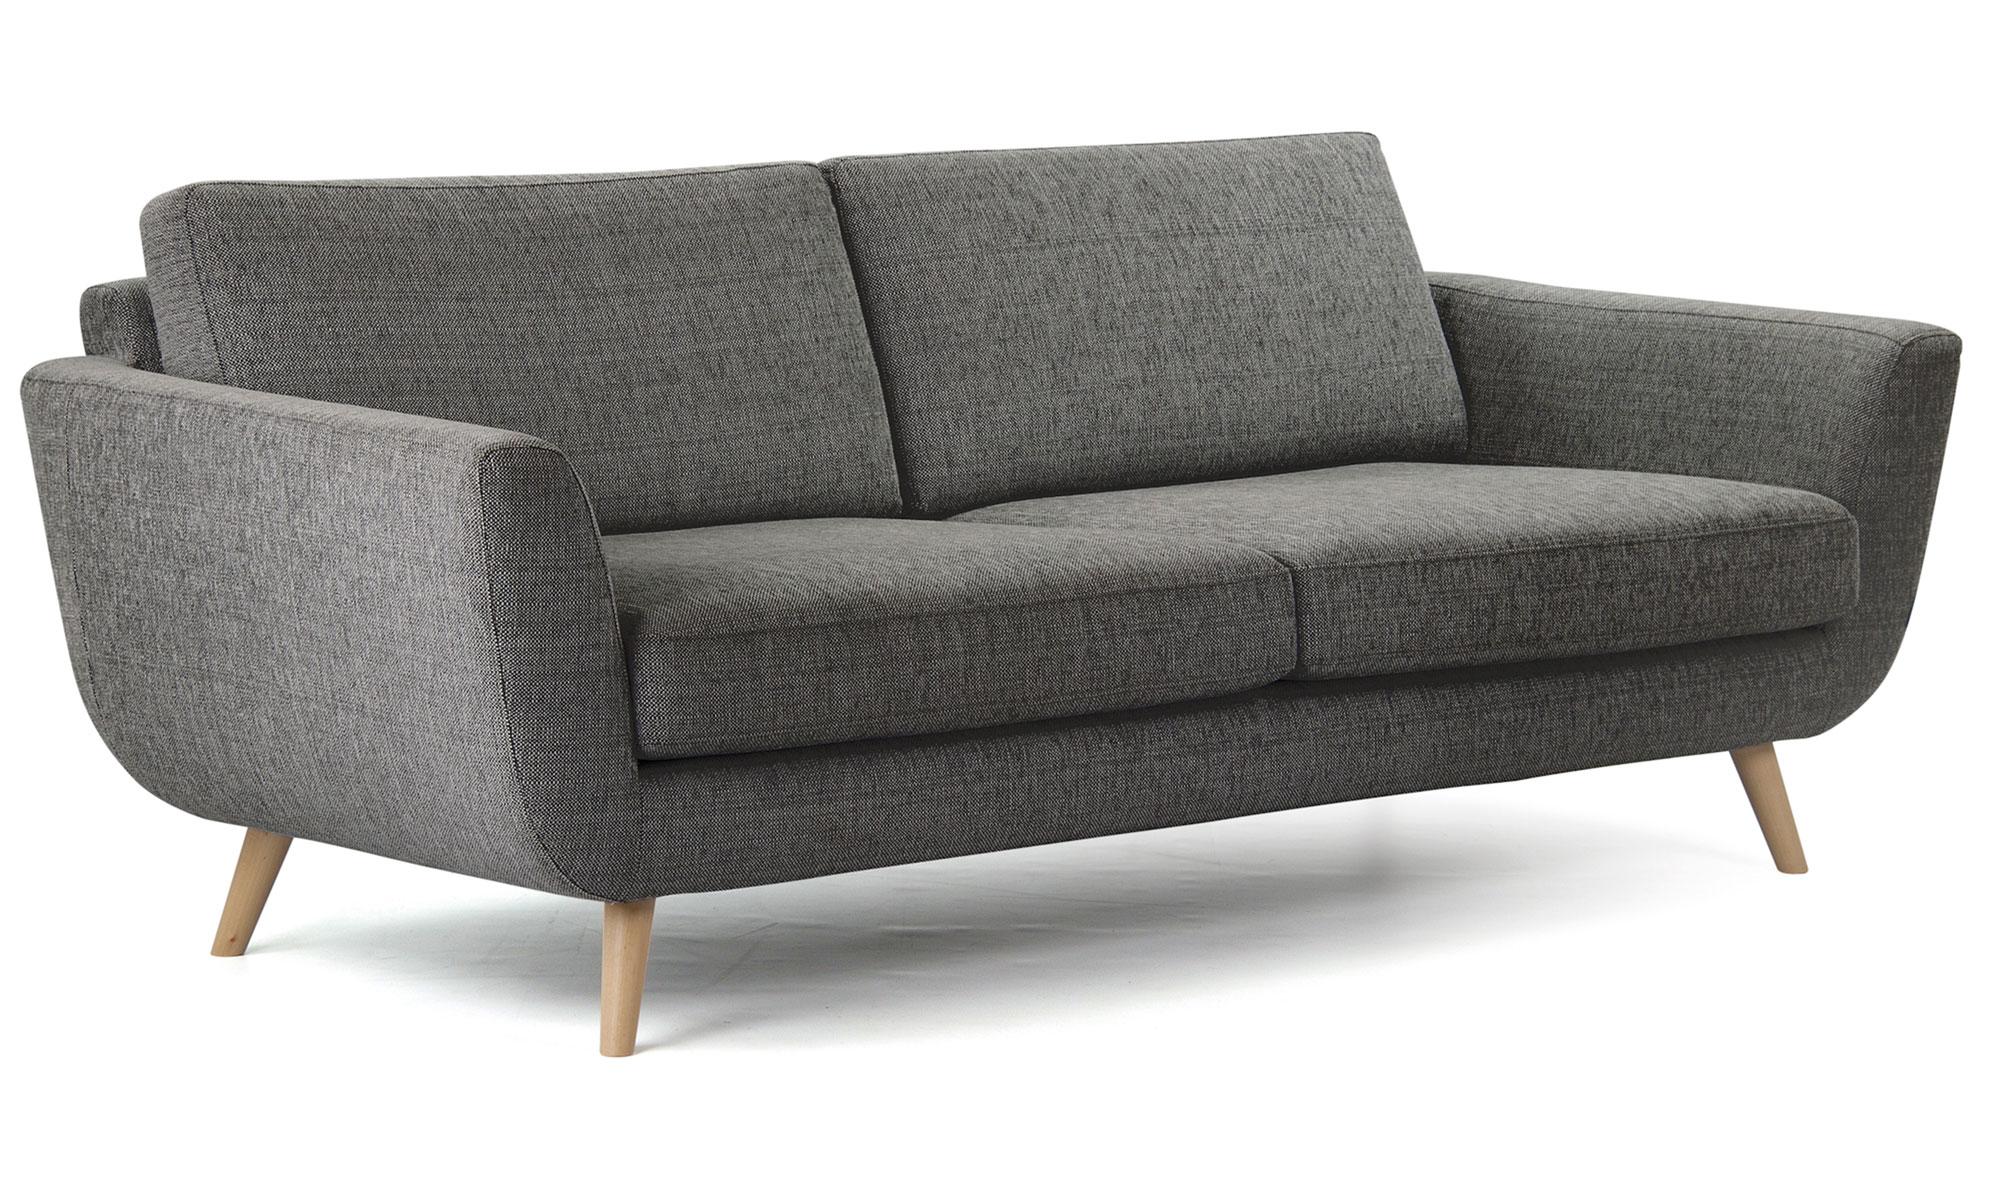 Sofá gris nórdico Alifan